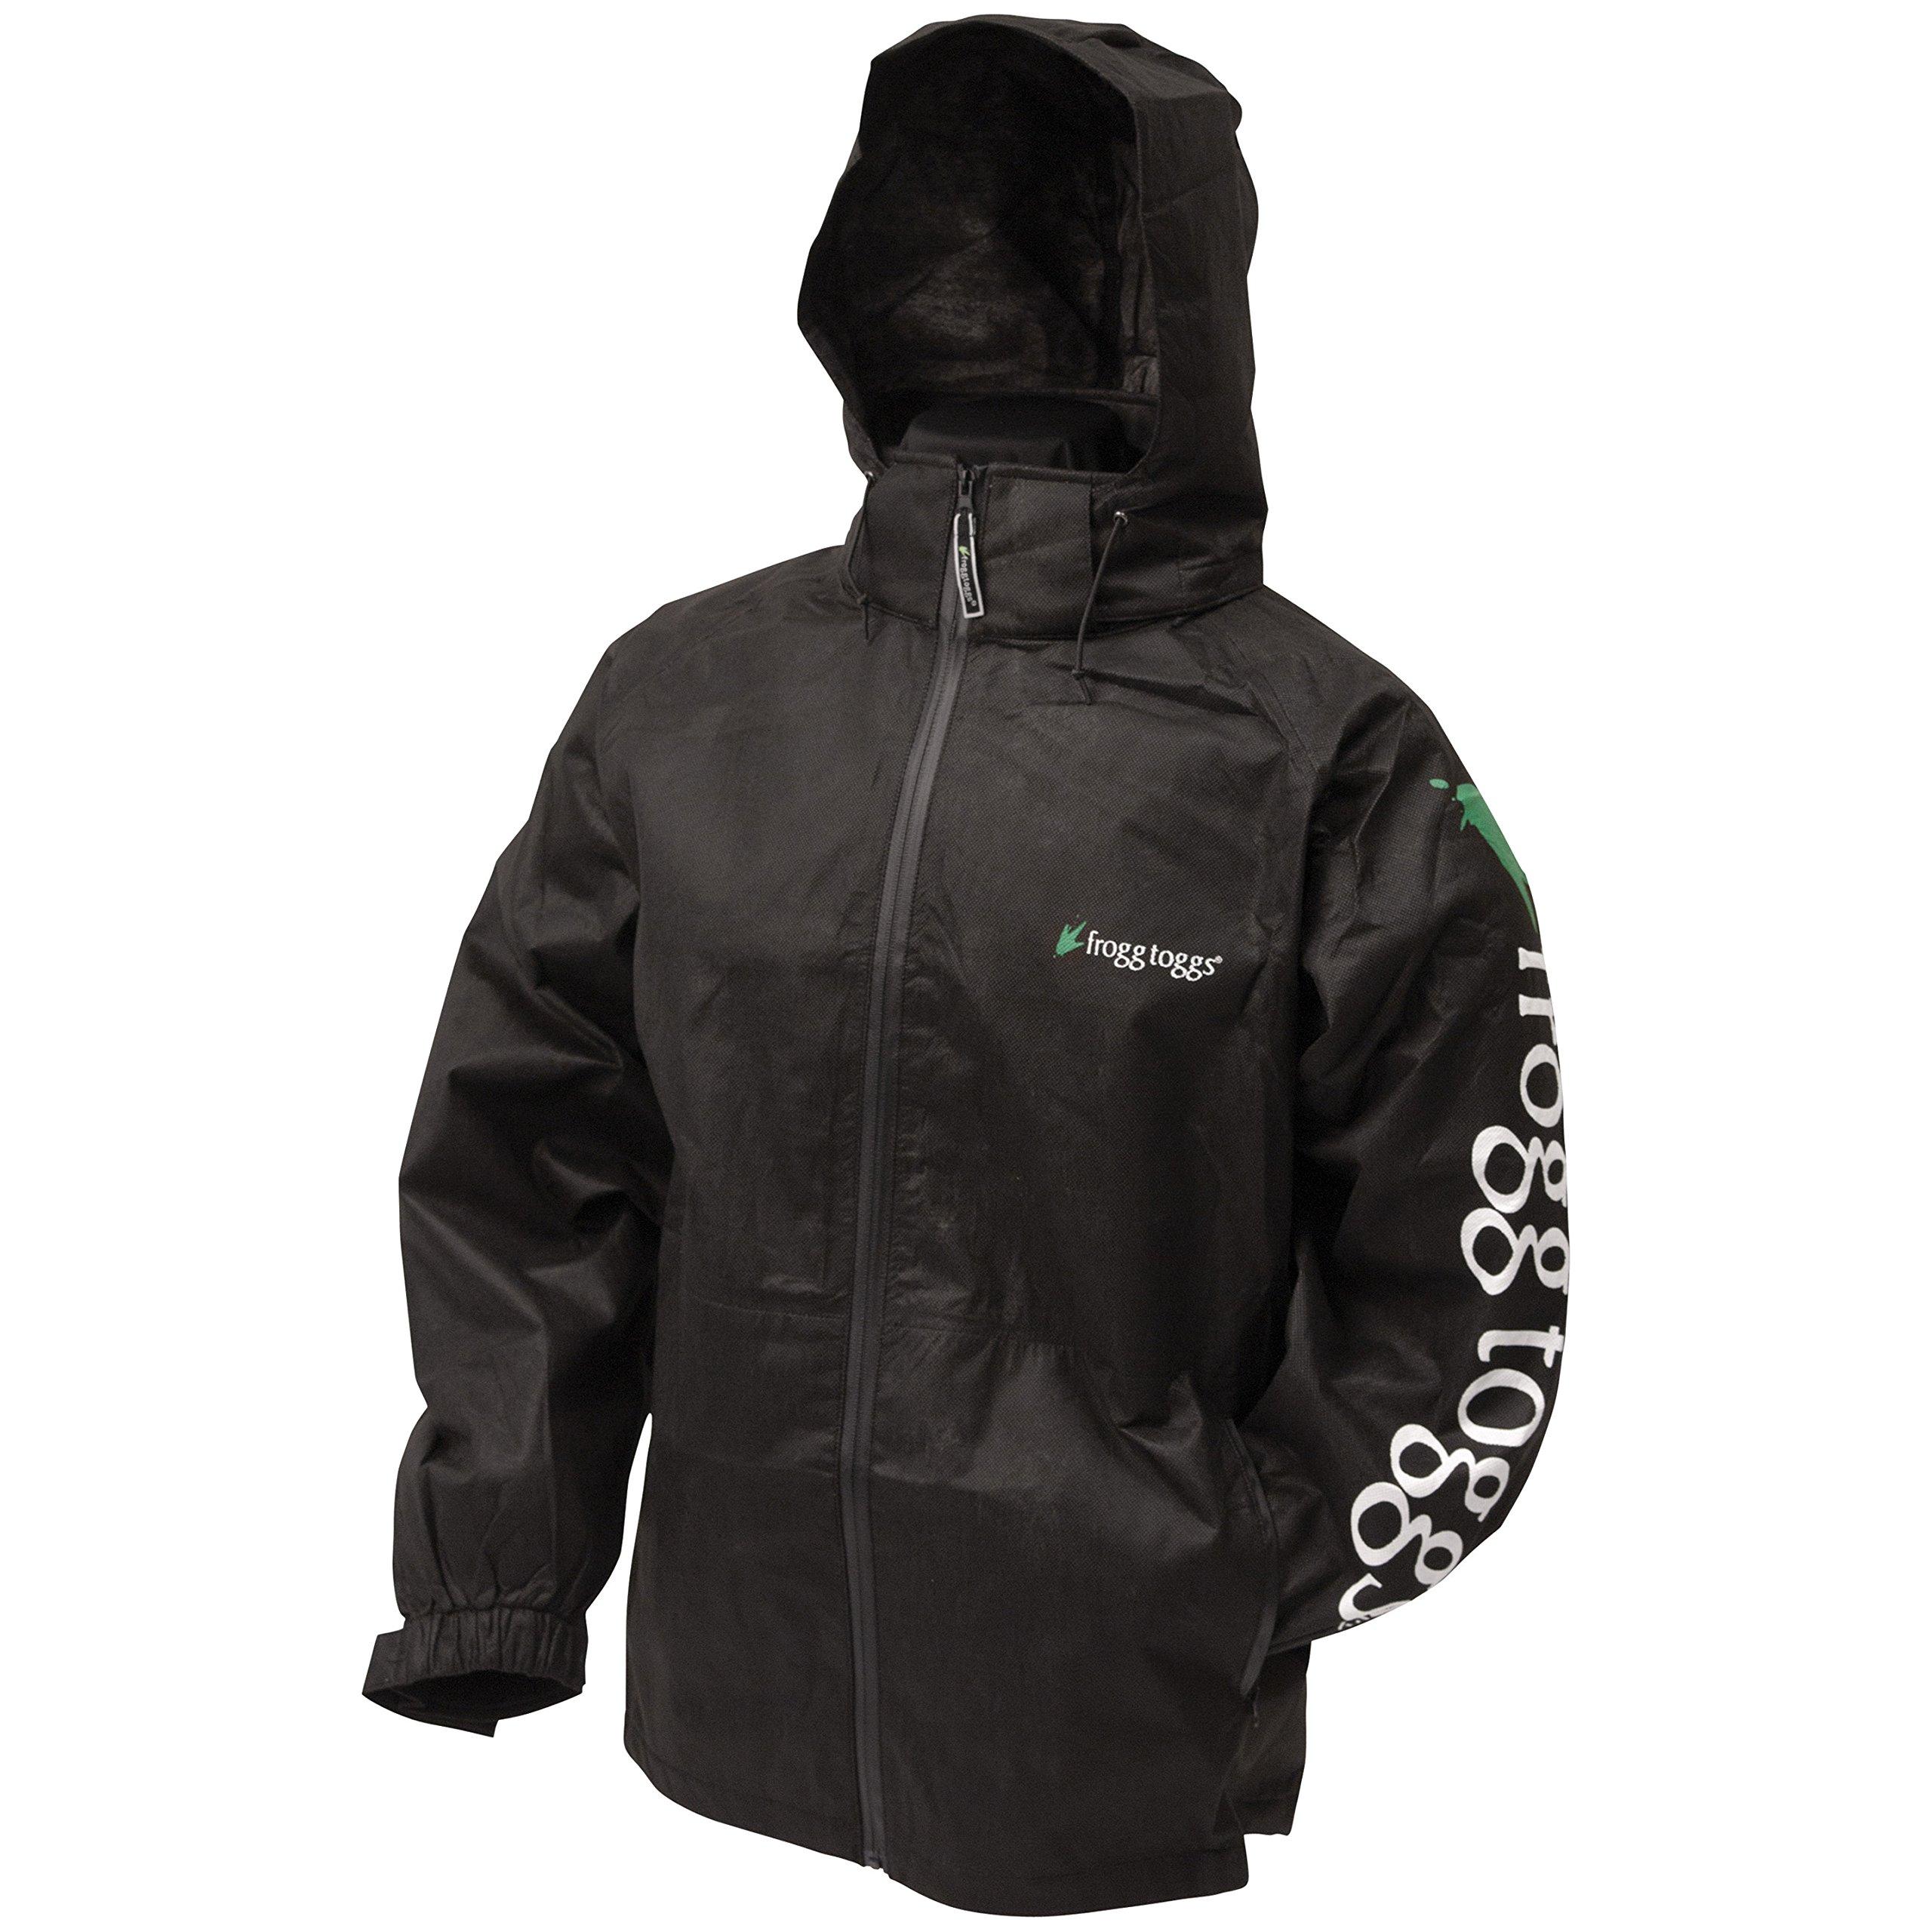 Frogg Toggs All Sports Full Zip Logo Jacket (Medium, Stone)